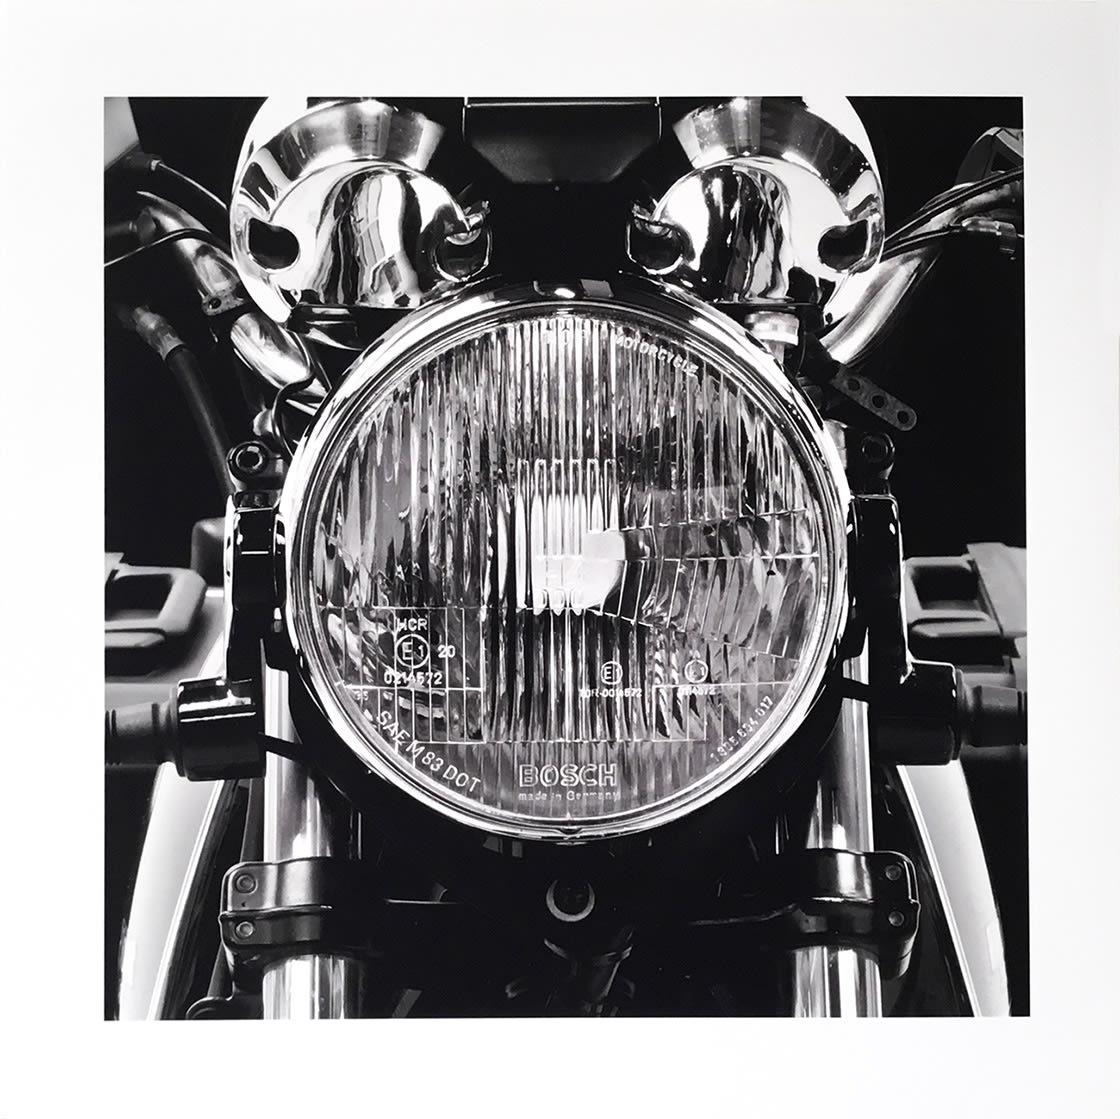 My 1000 CC Airhead 1995 R100R, 2011 by James Lahey at Kostuik Gallery